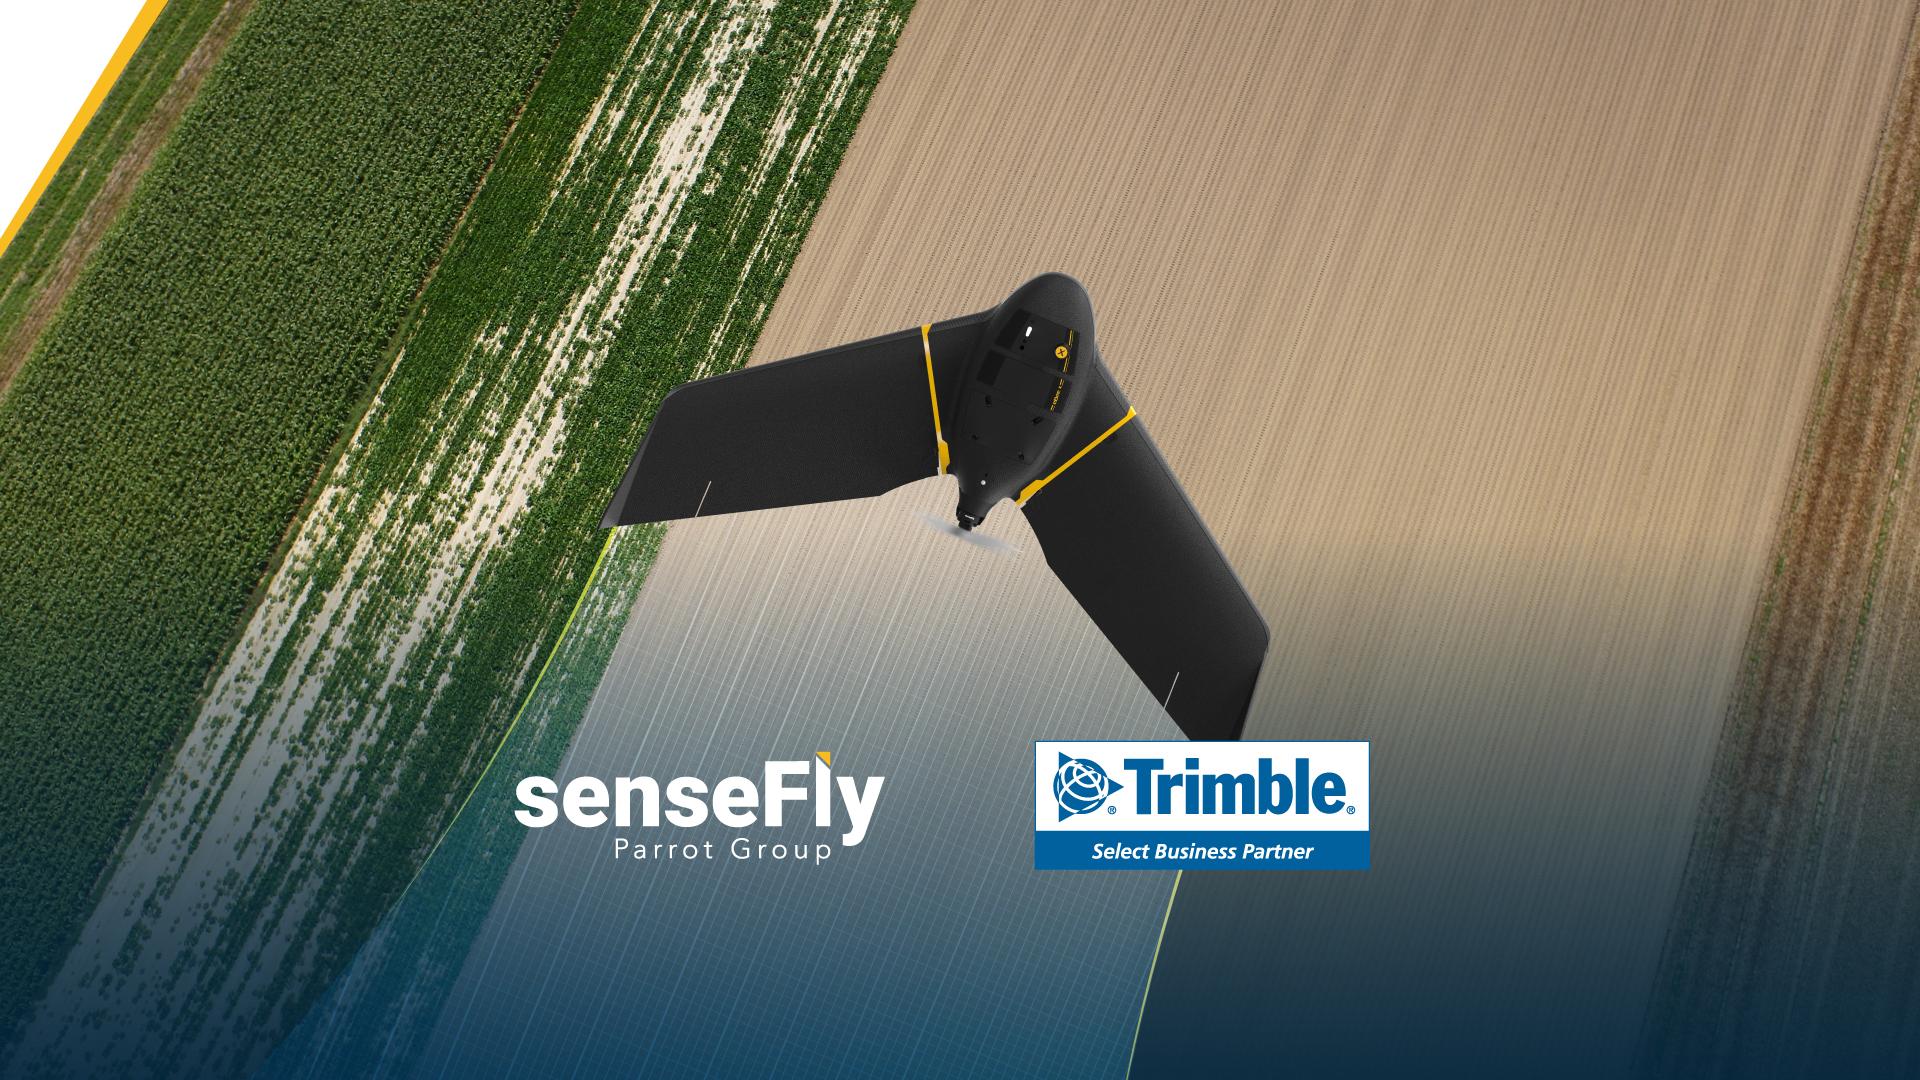 senseFly drone